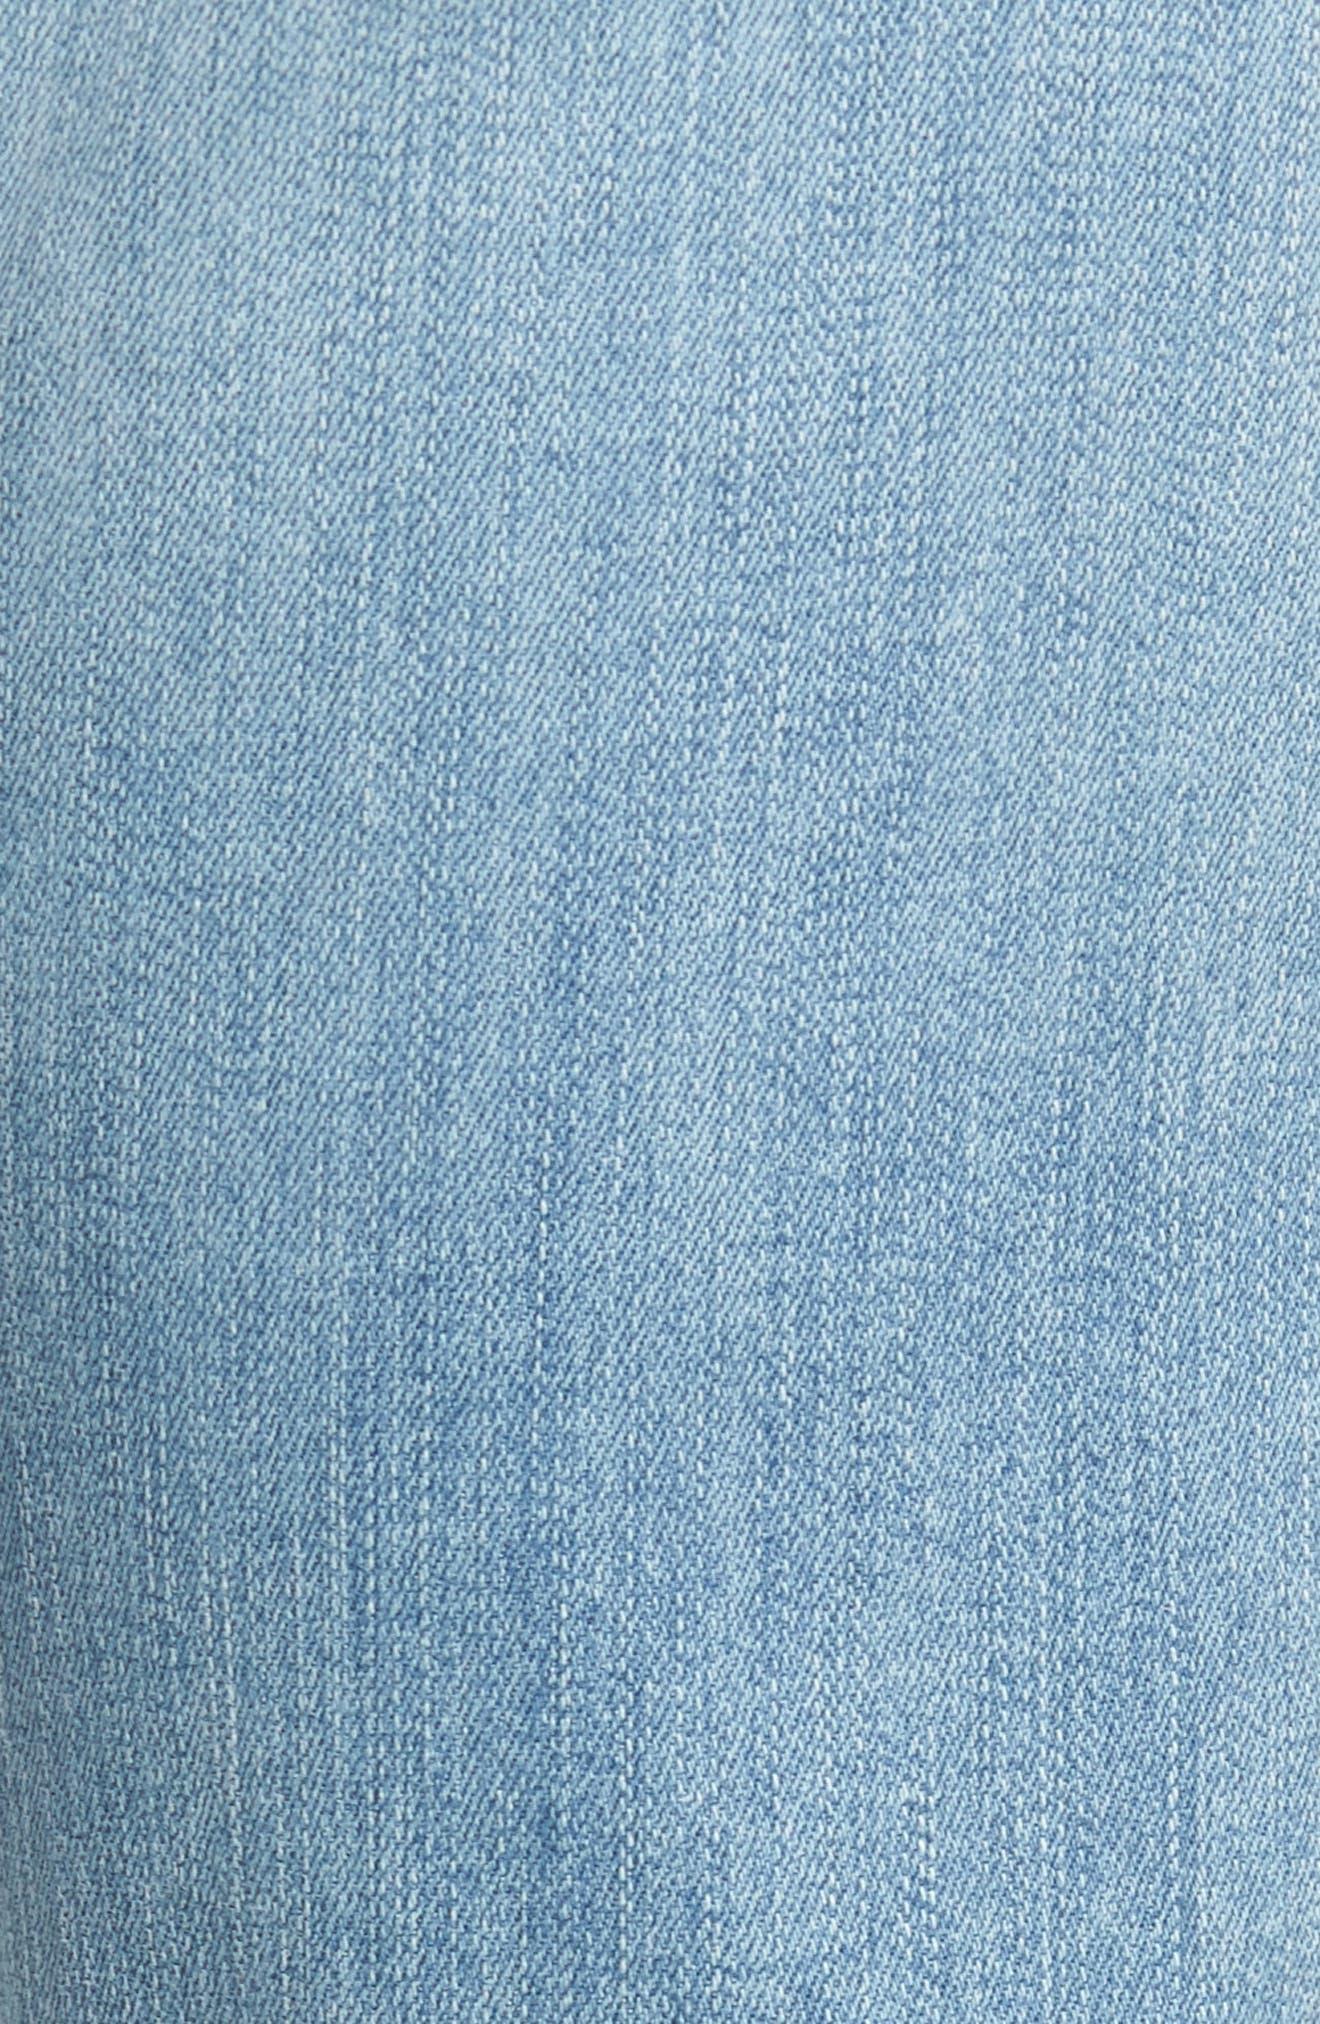 Transcend Vintage - Lennox Slim Fit Jeans,                             Alternate thumbnail 5, color,                             DENVER